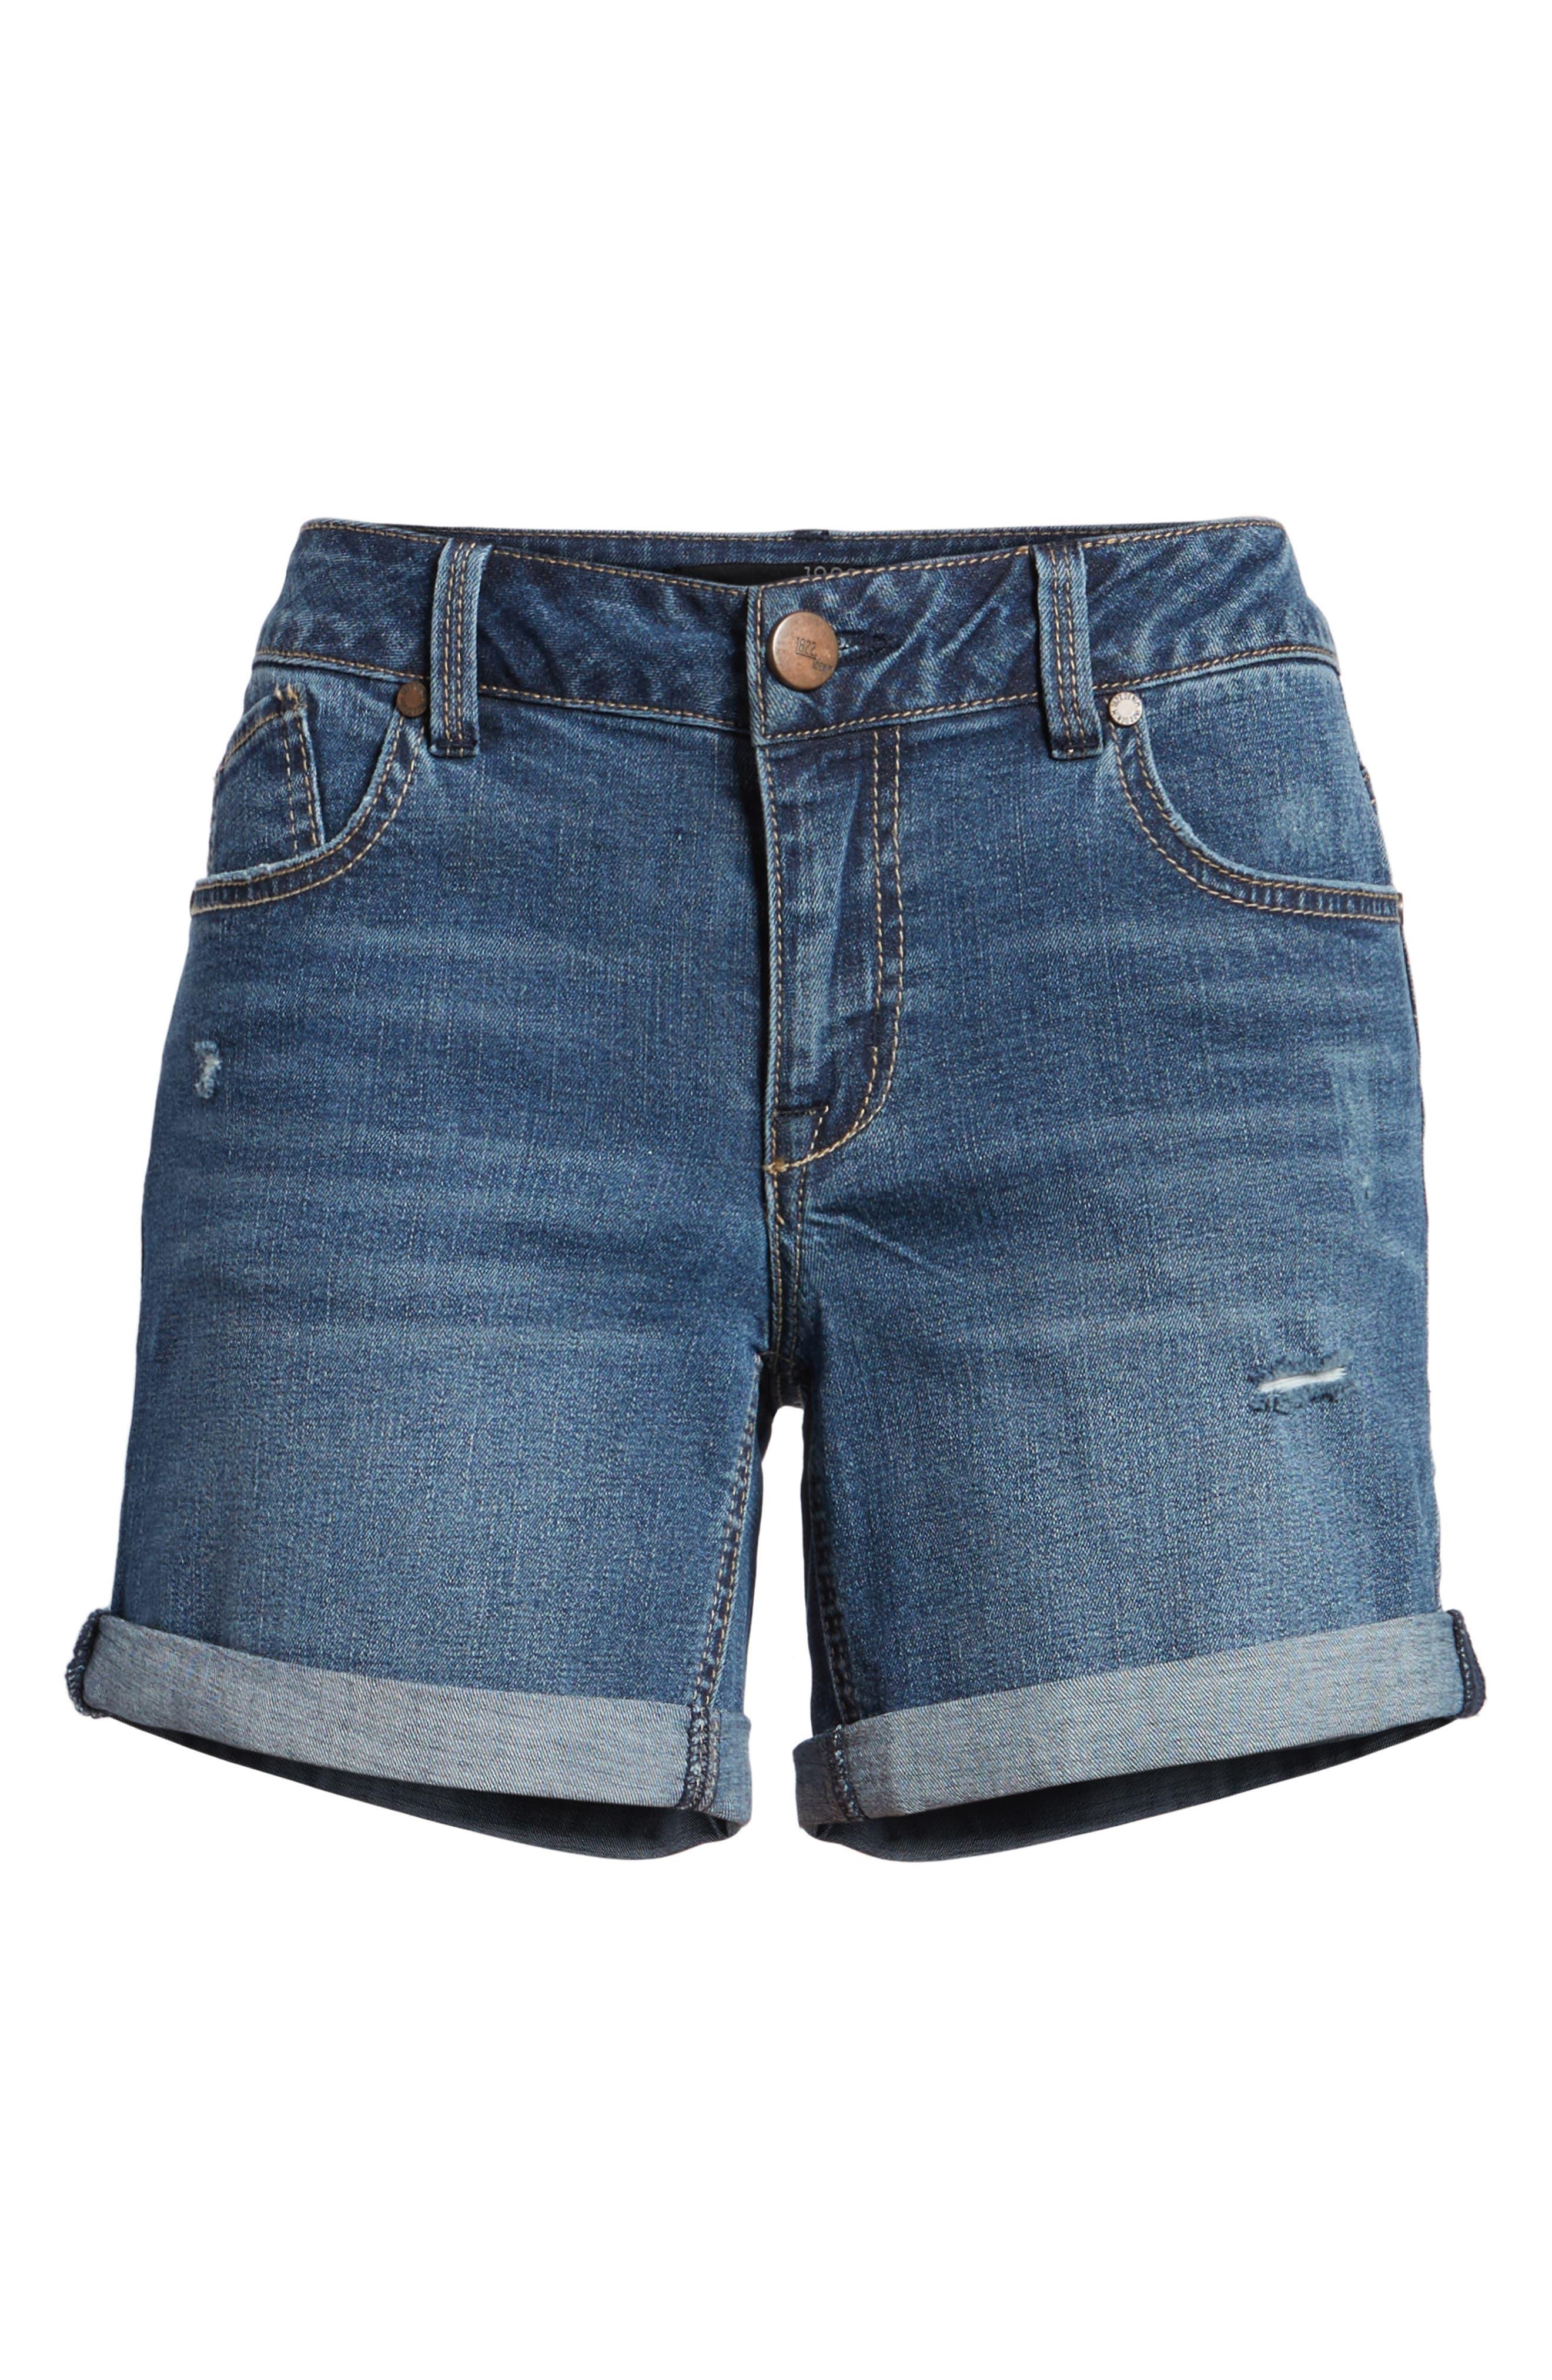 Roll Cuff Denim Shorts,                             Alternate thumbnail 6, color,                             426